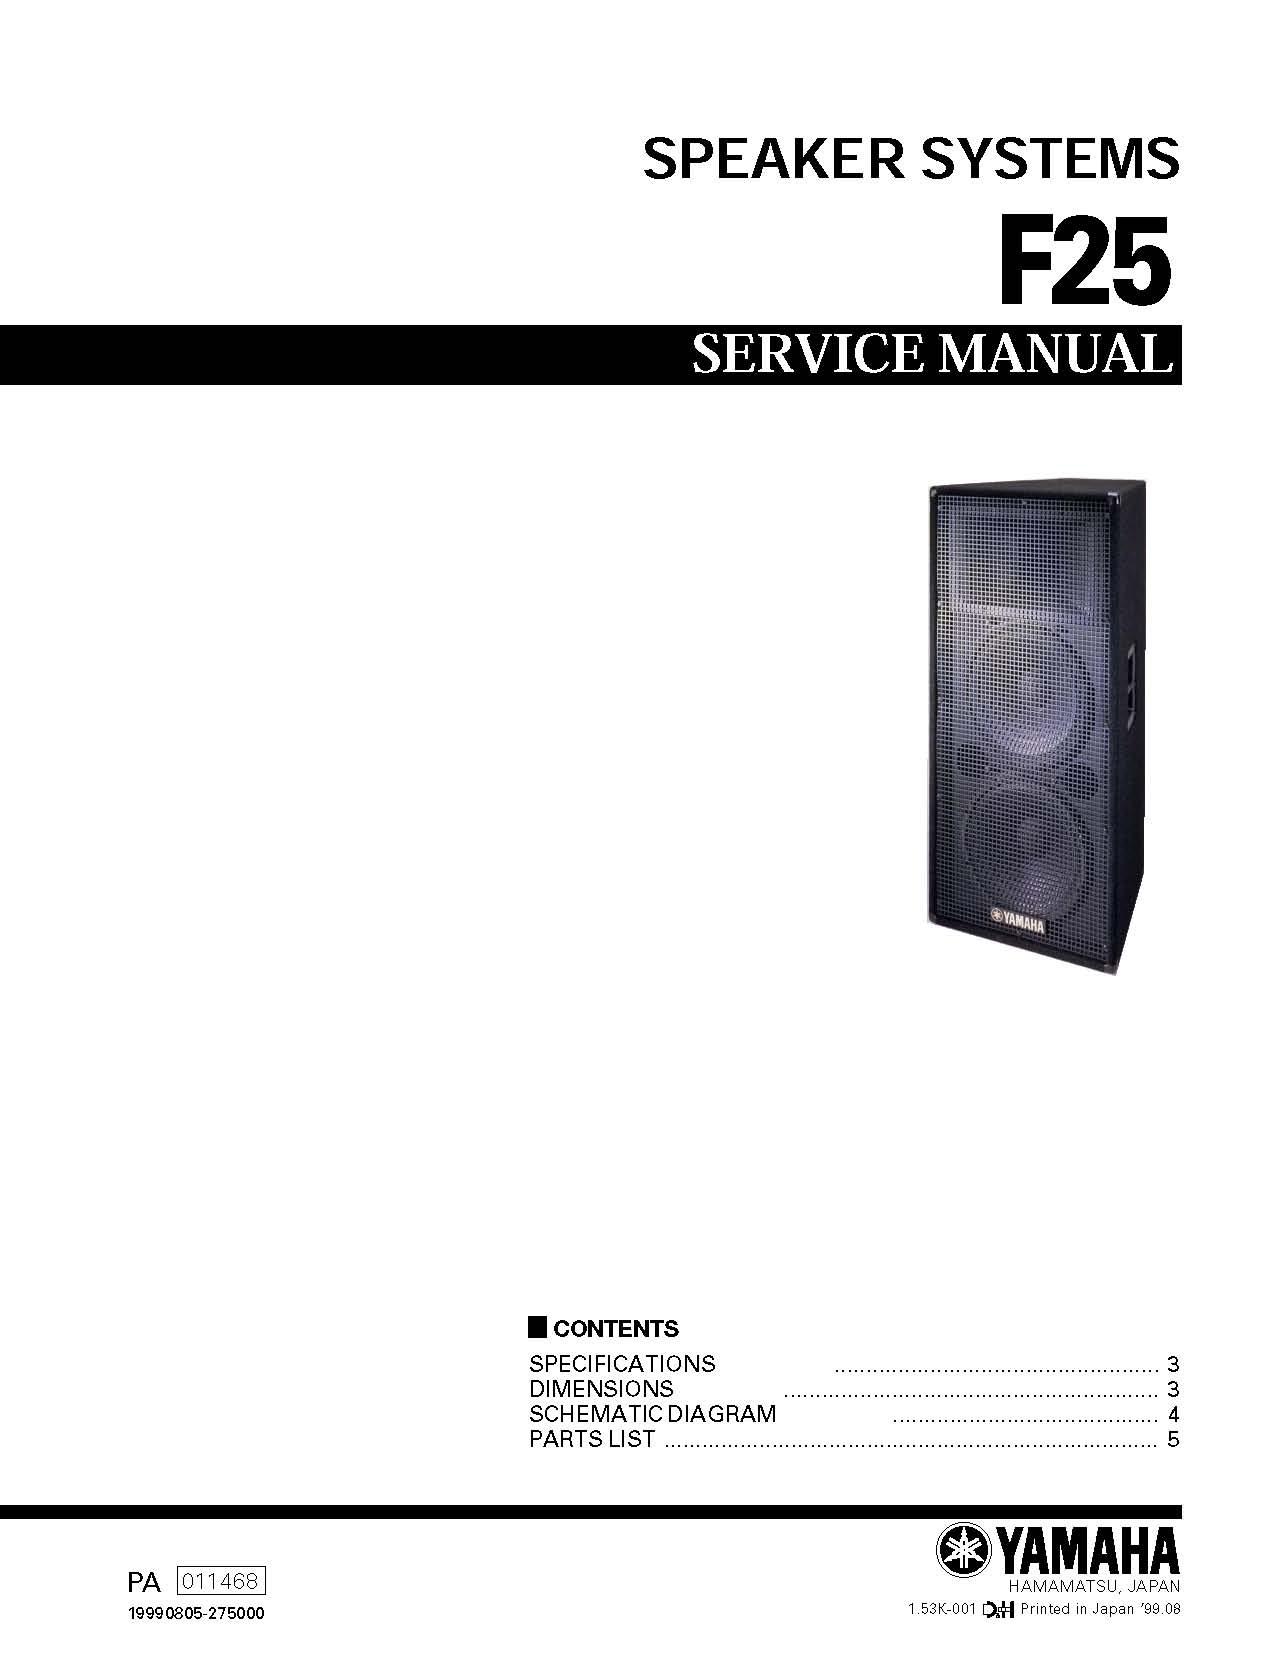 yamaha f25 service manual music manuals rh sellfy com 2017 yamaha f25 owners manual yamaha f25 owners manual